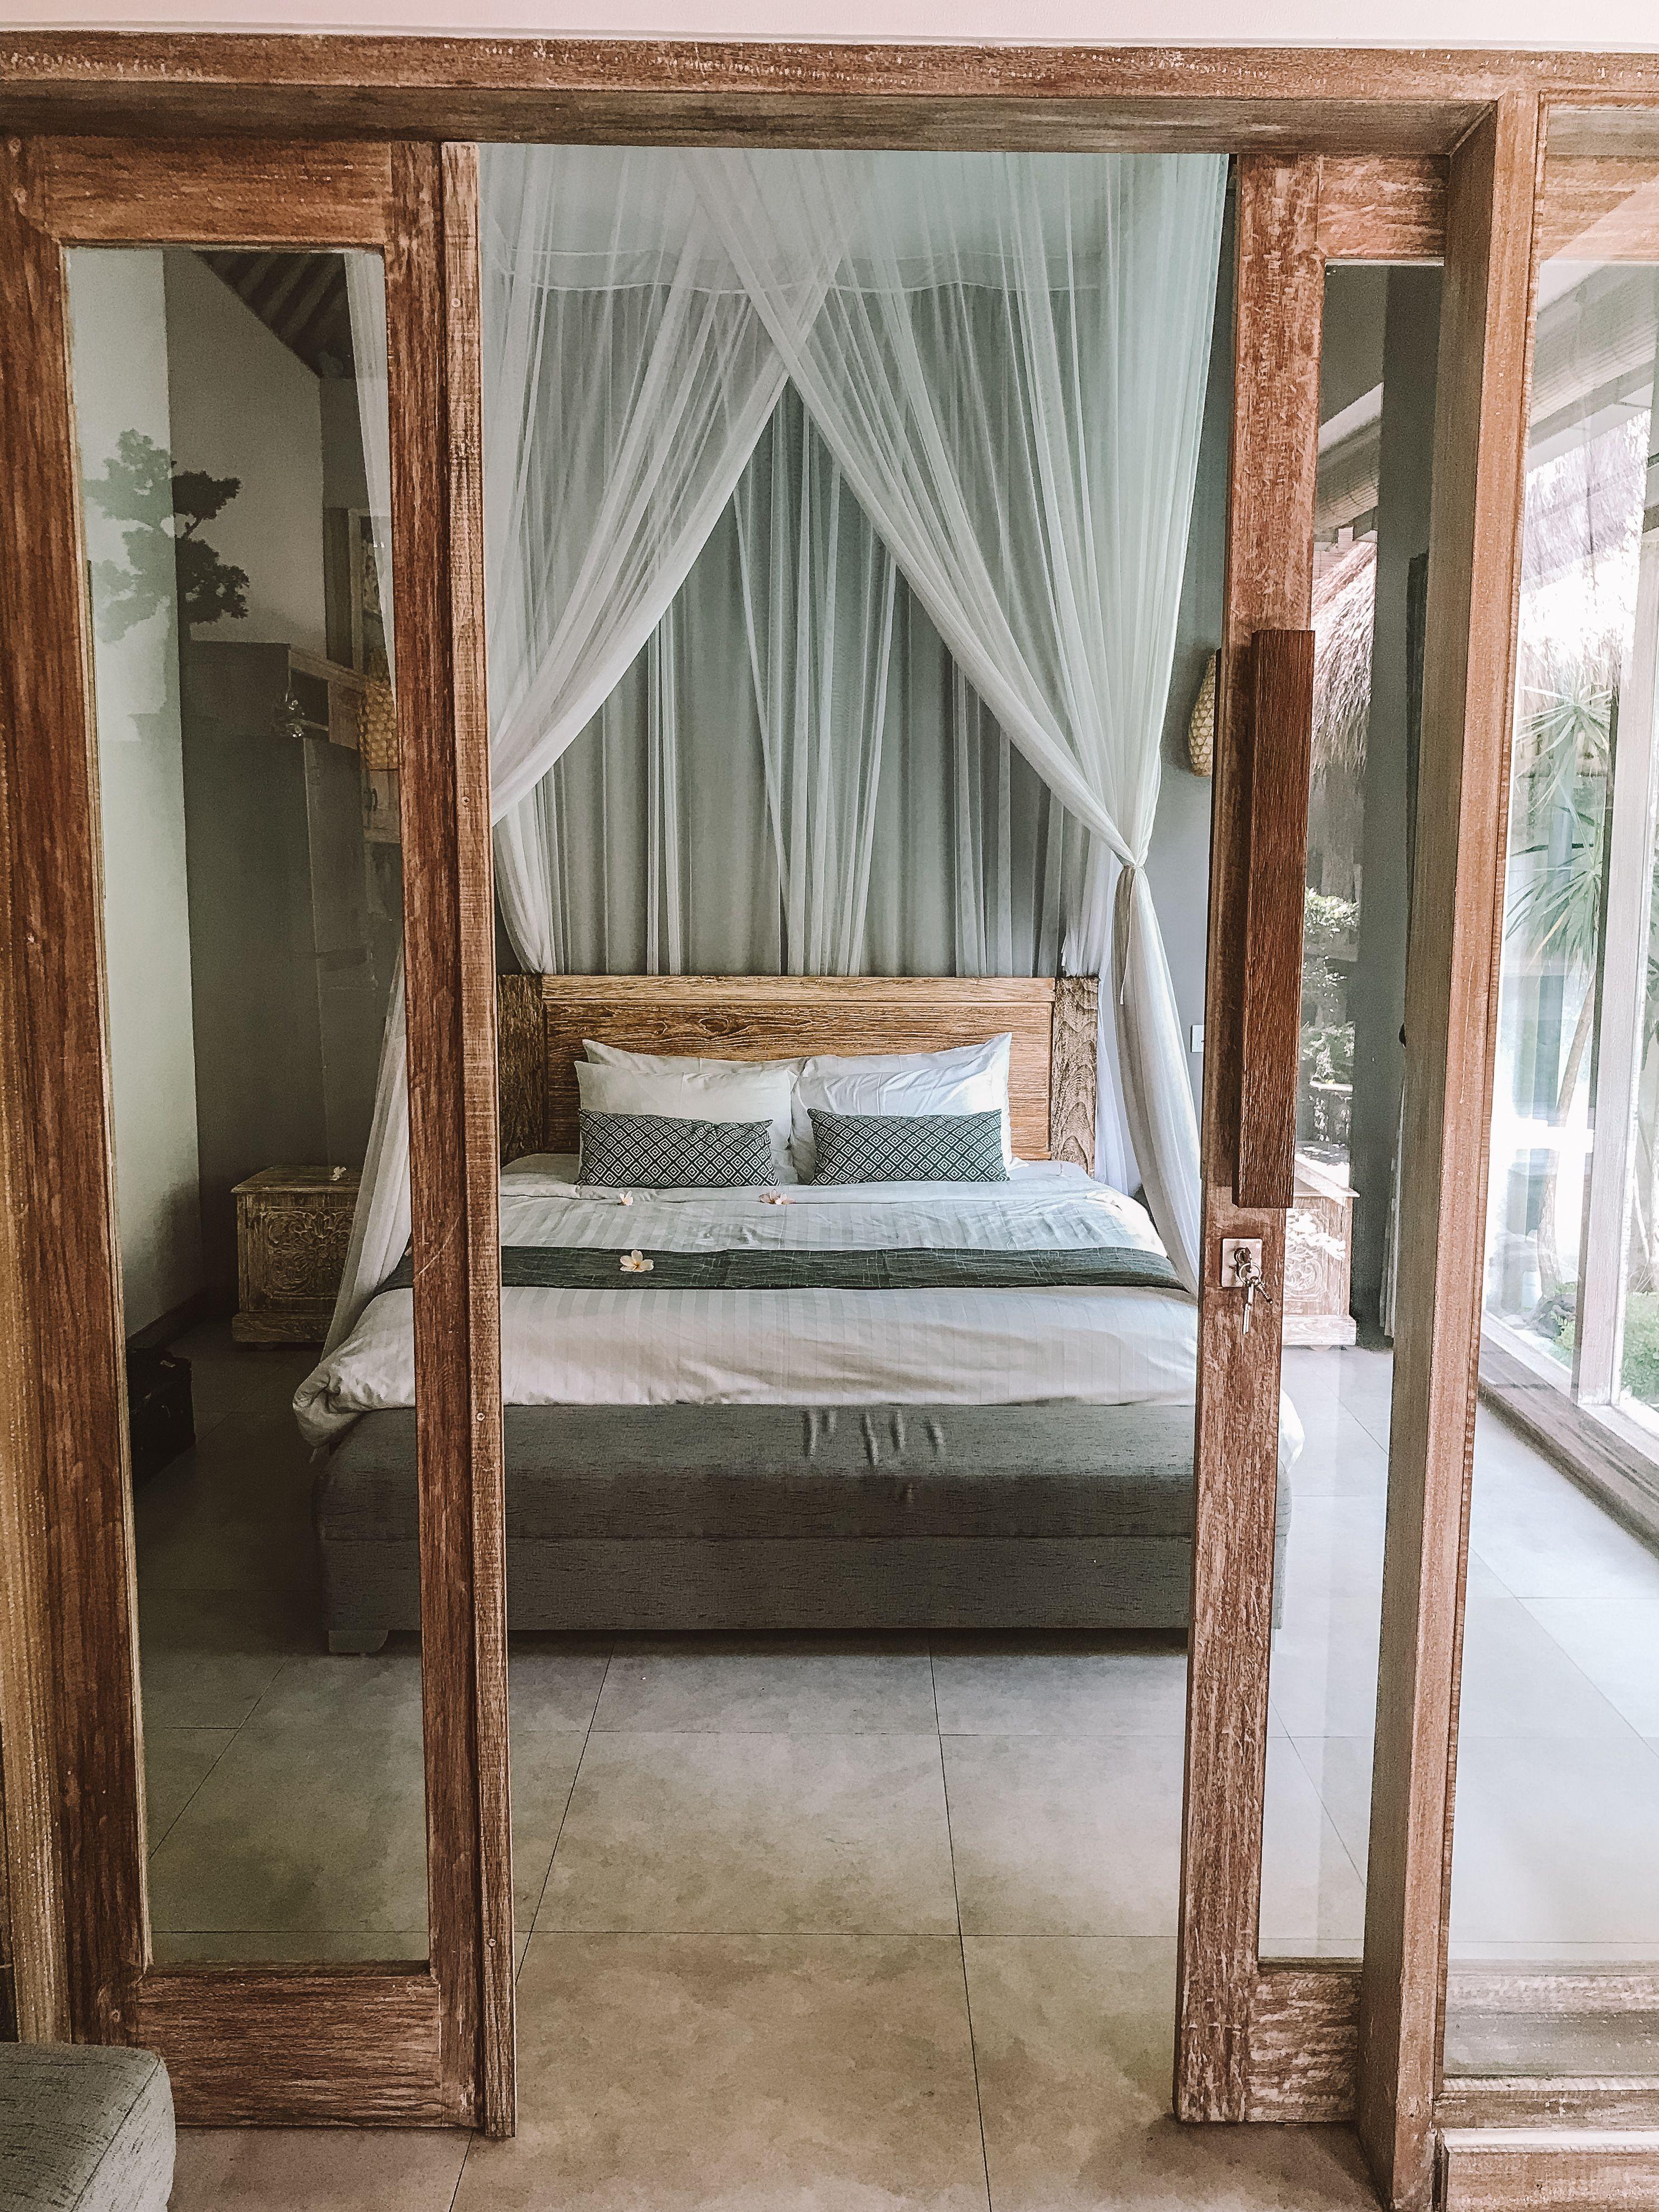 5 Choses A Faire A Canggu Villa De Reve Boheme Moderne Belle Villa